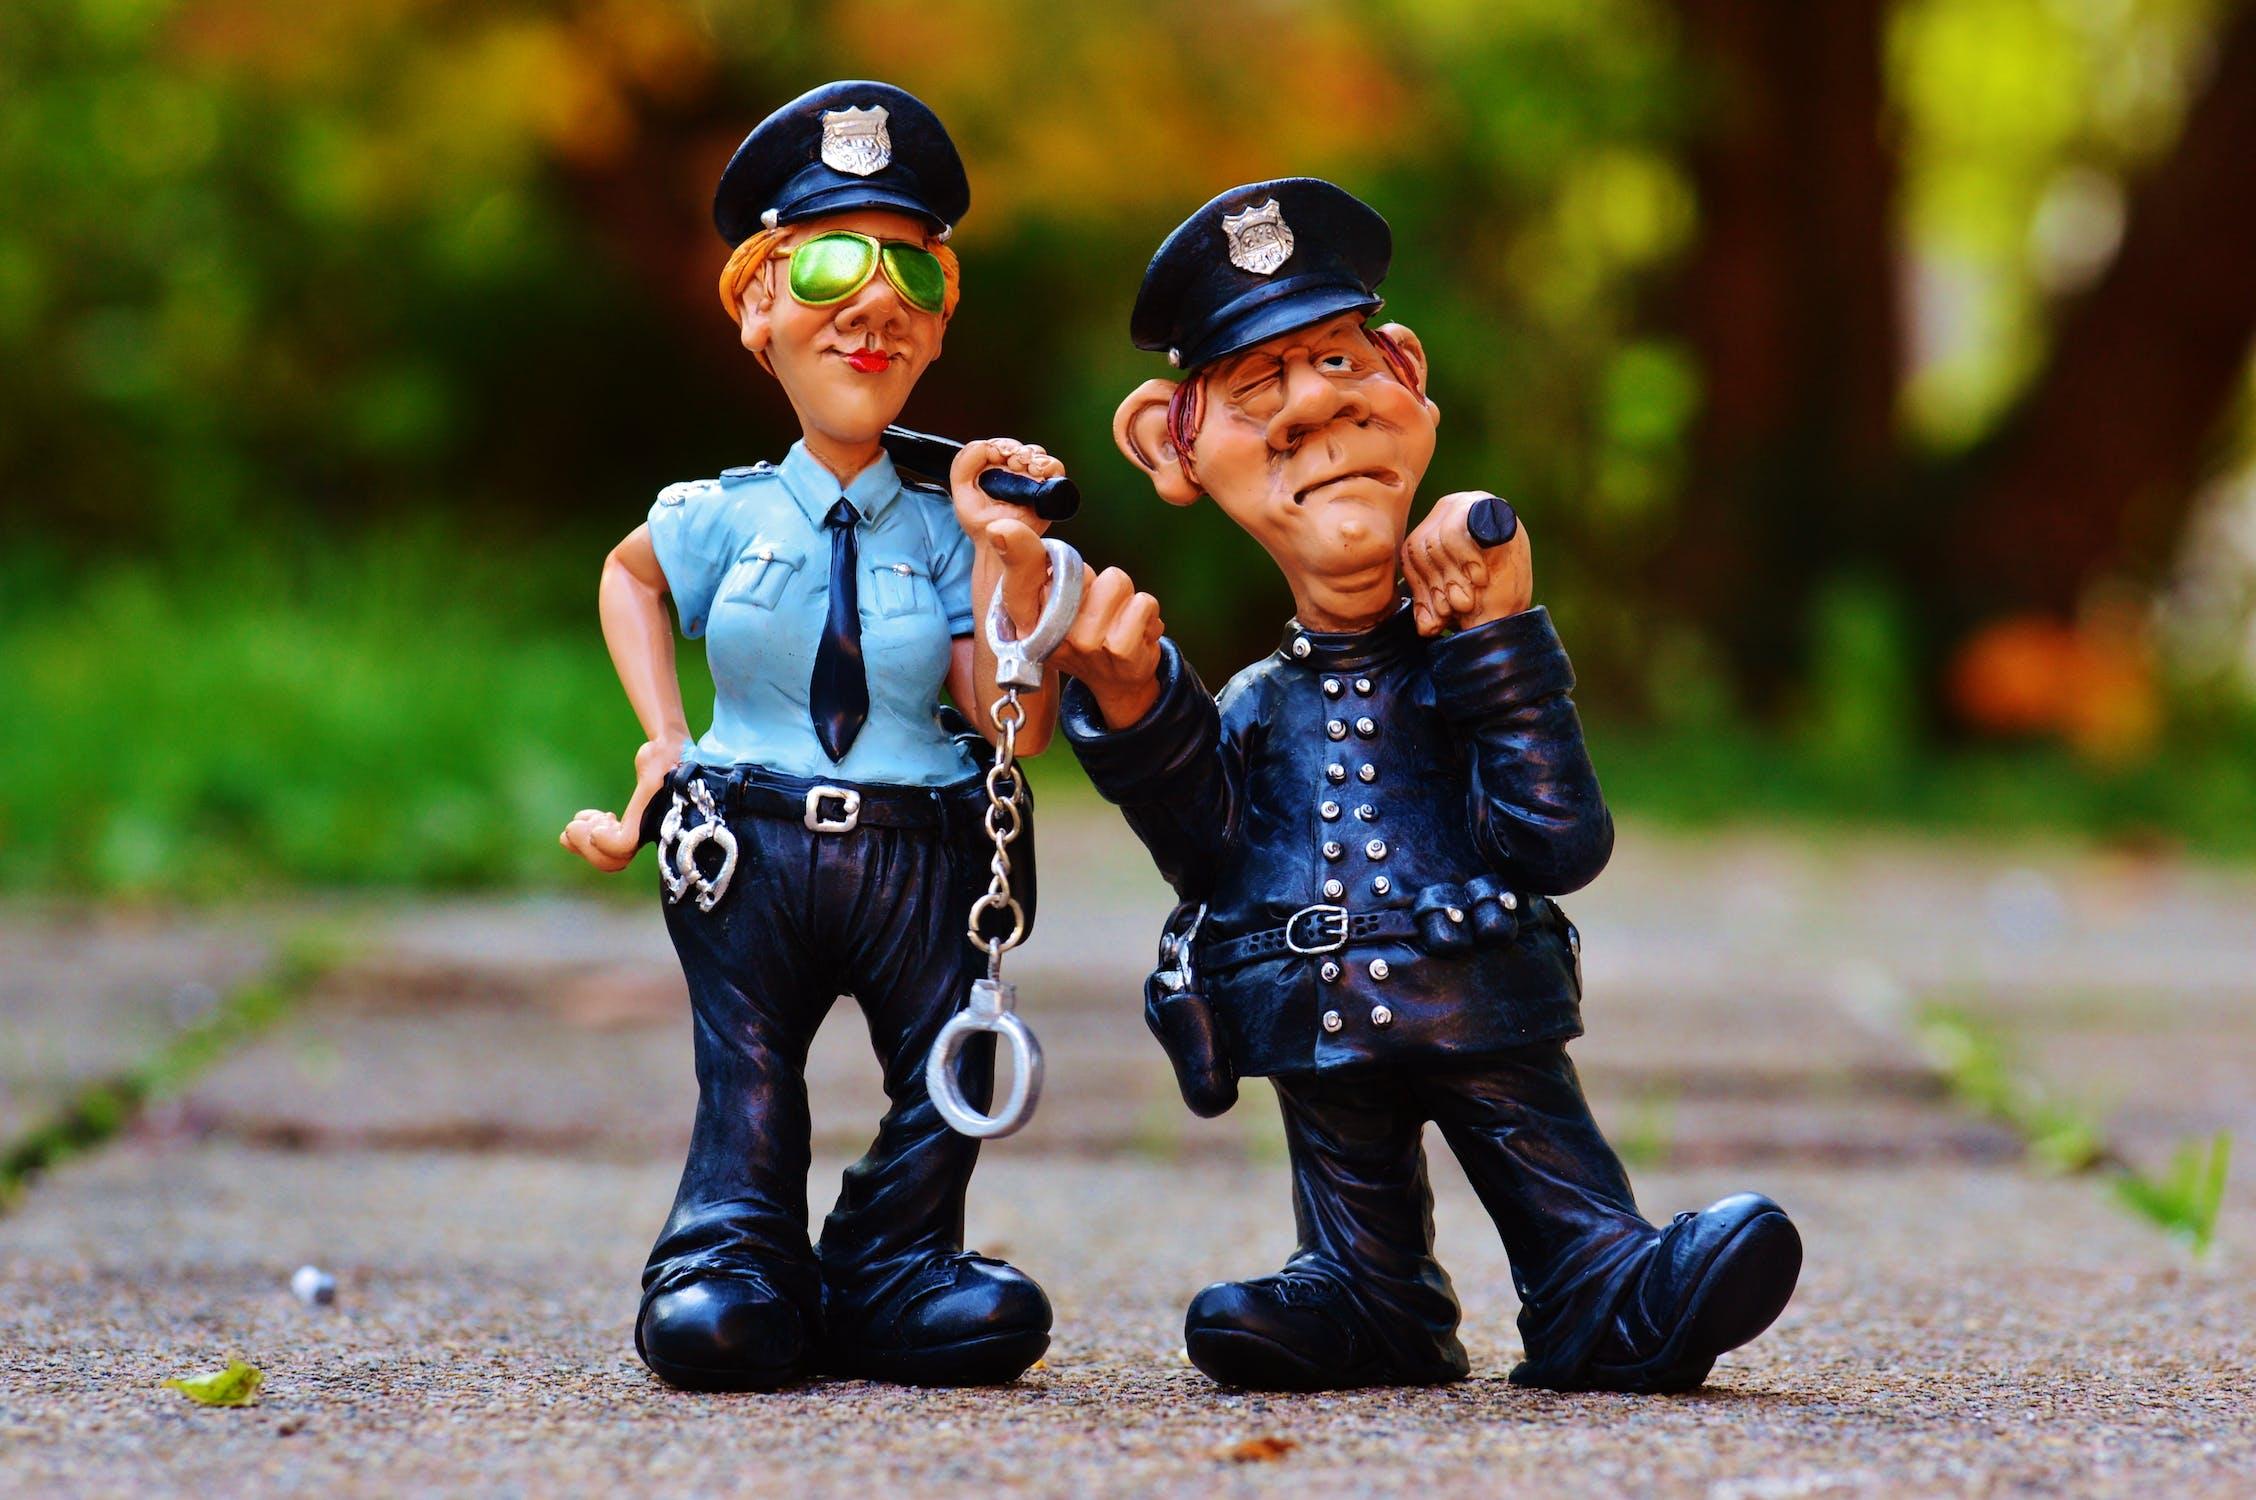 Обжалование административного штрафа